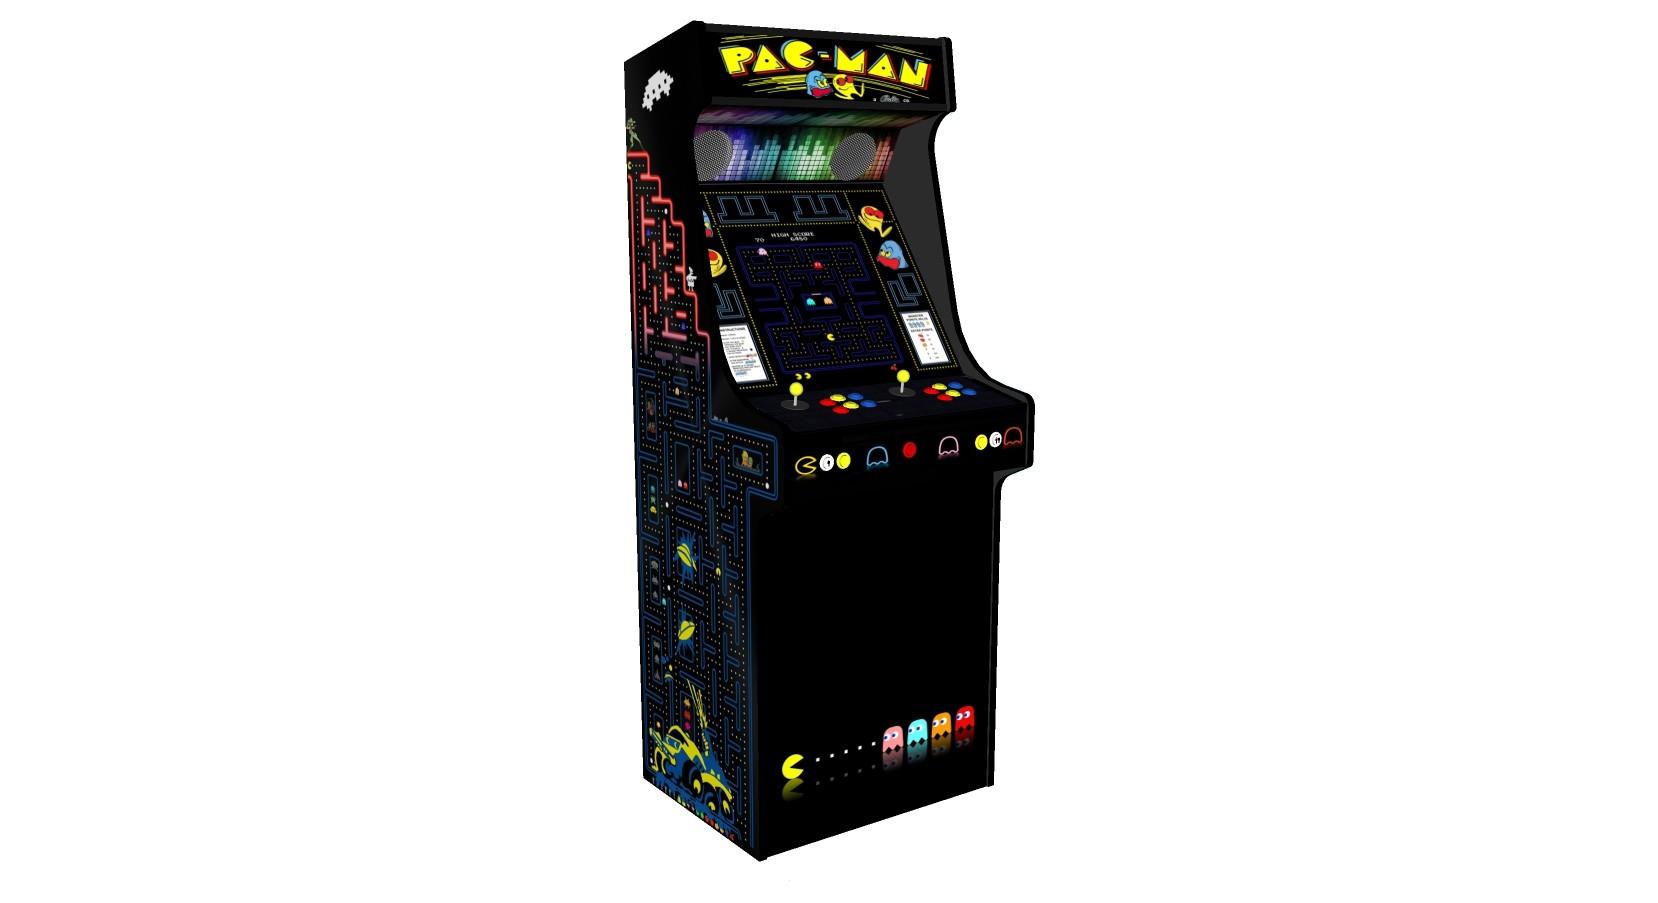 Classic Upright Arcade Machine - PacMan Theme - V2 - retropi 15000 games subwoofer left